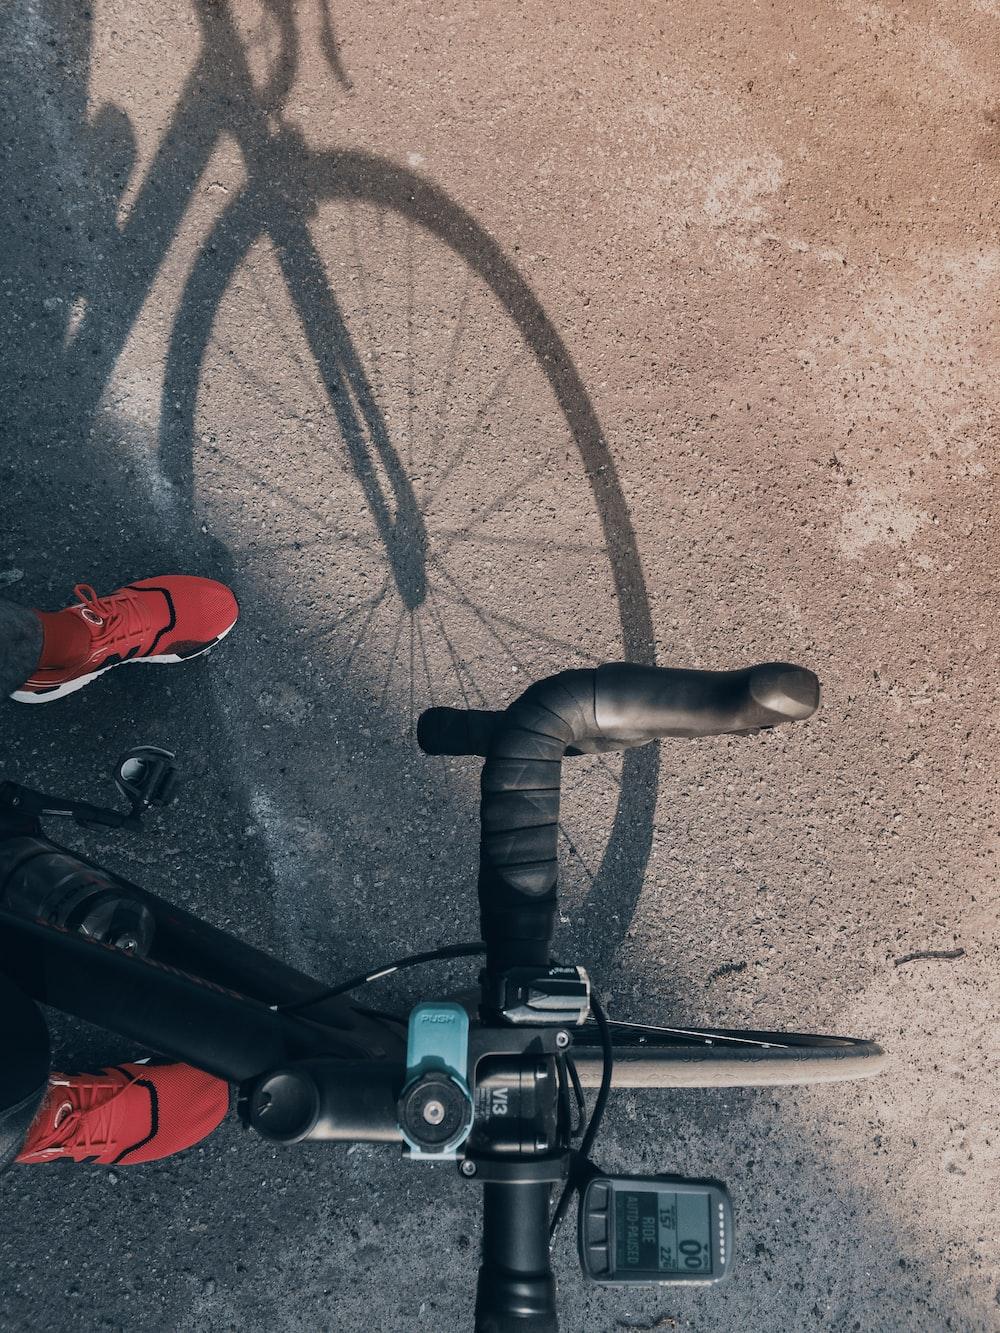 person rides road bike